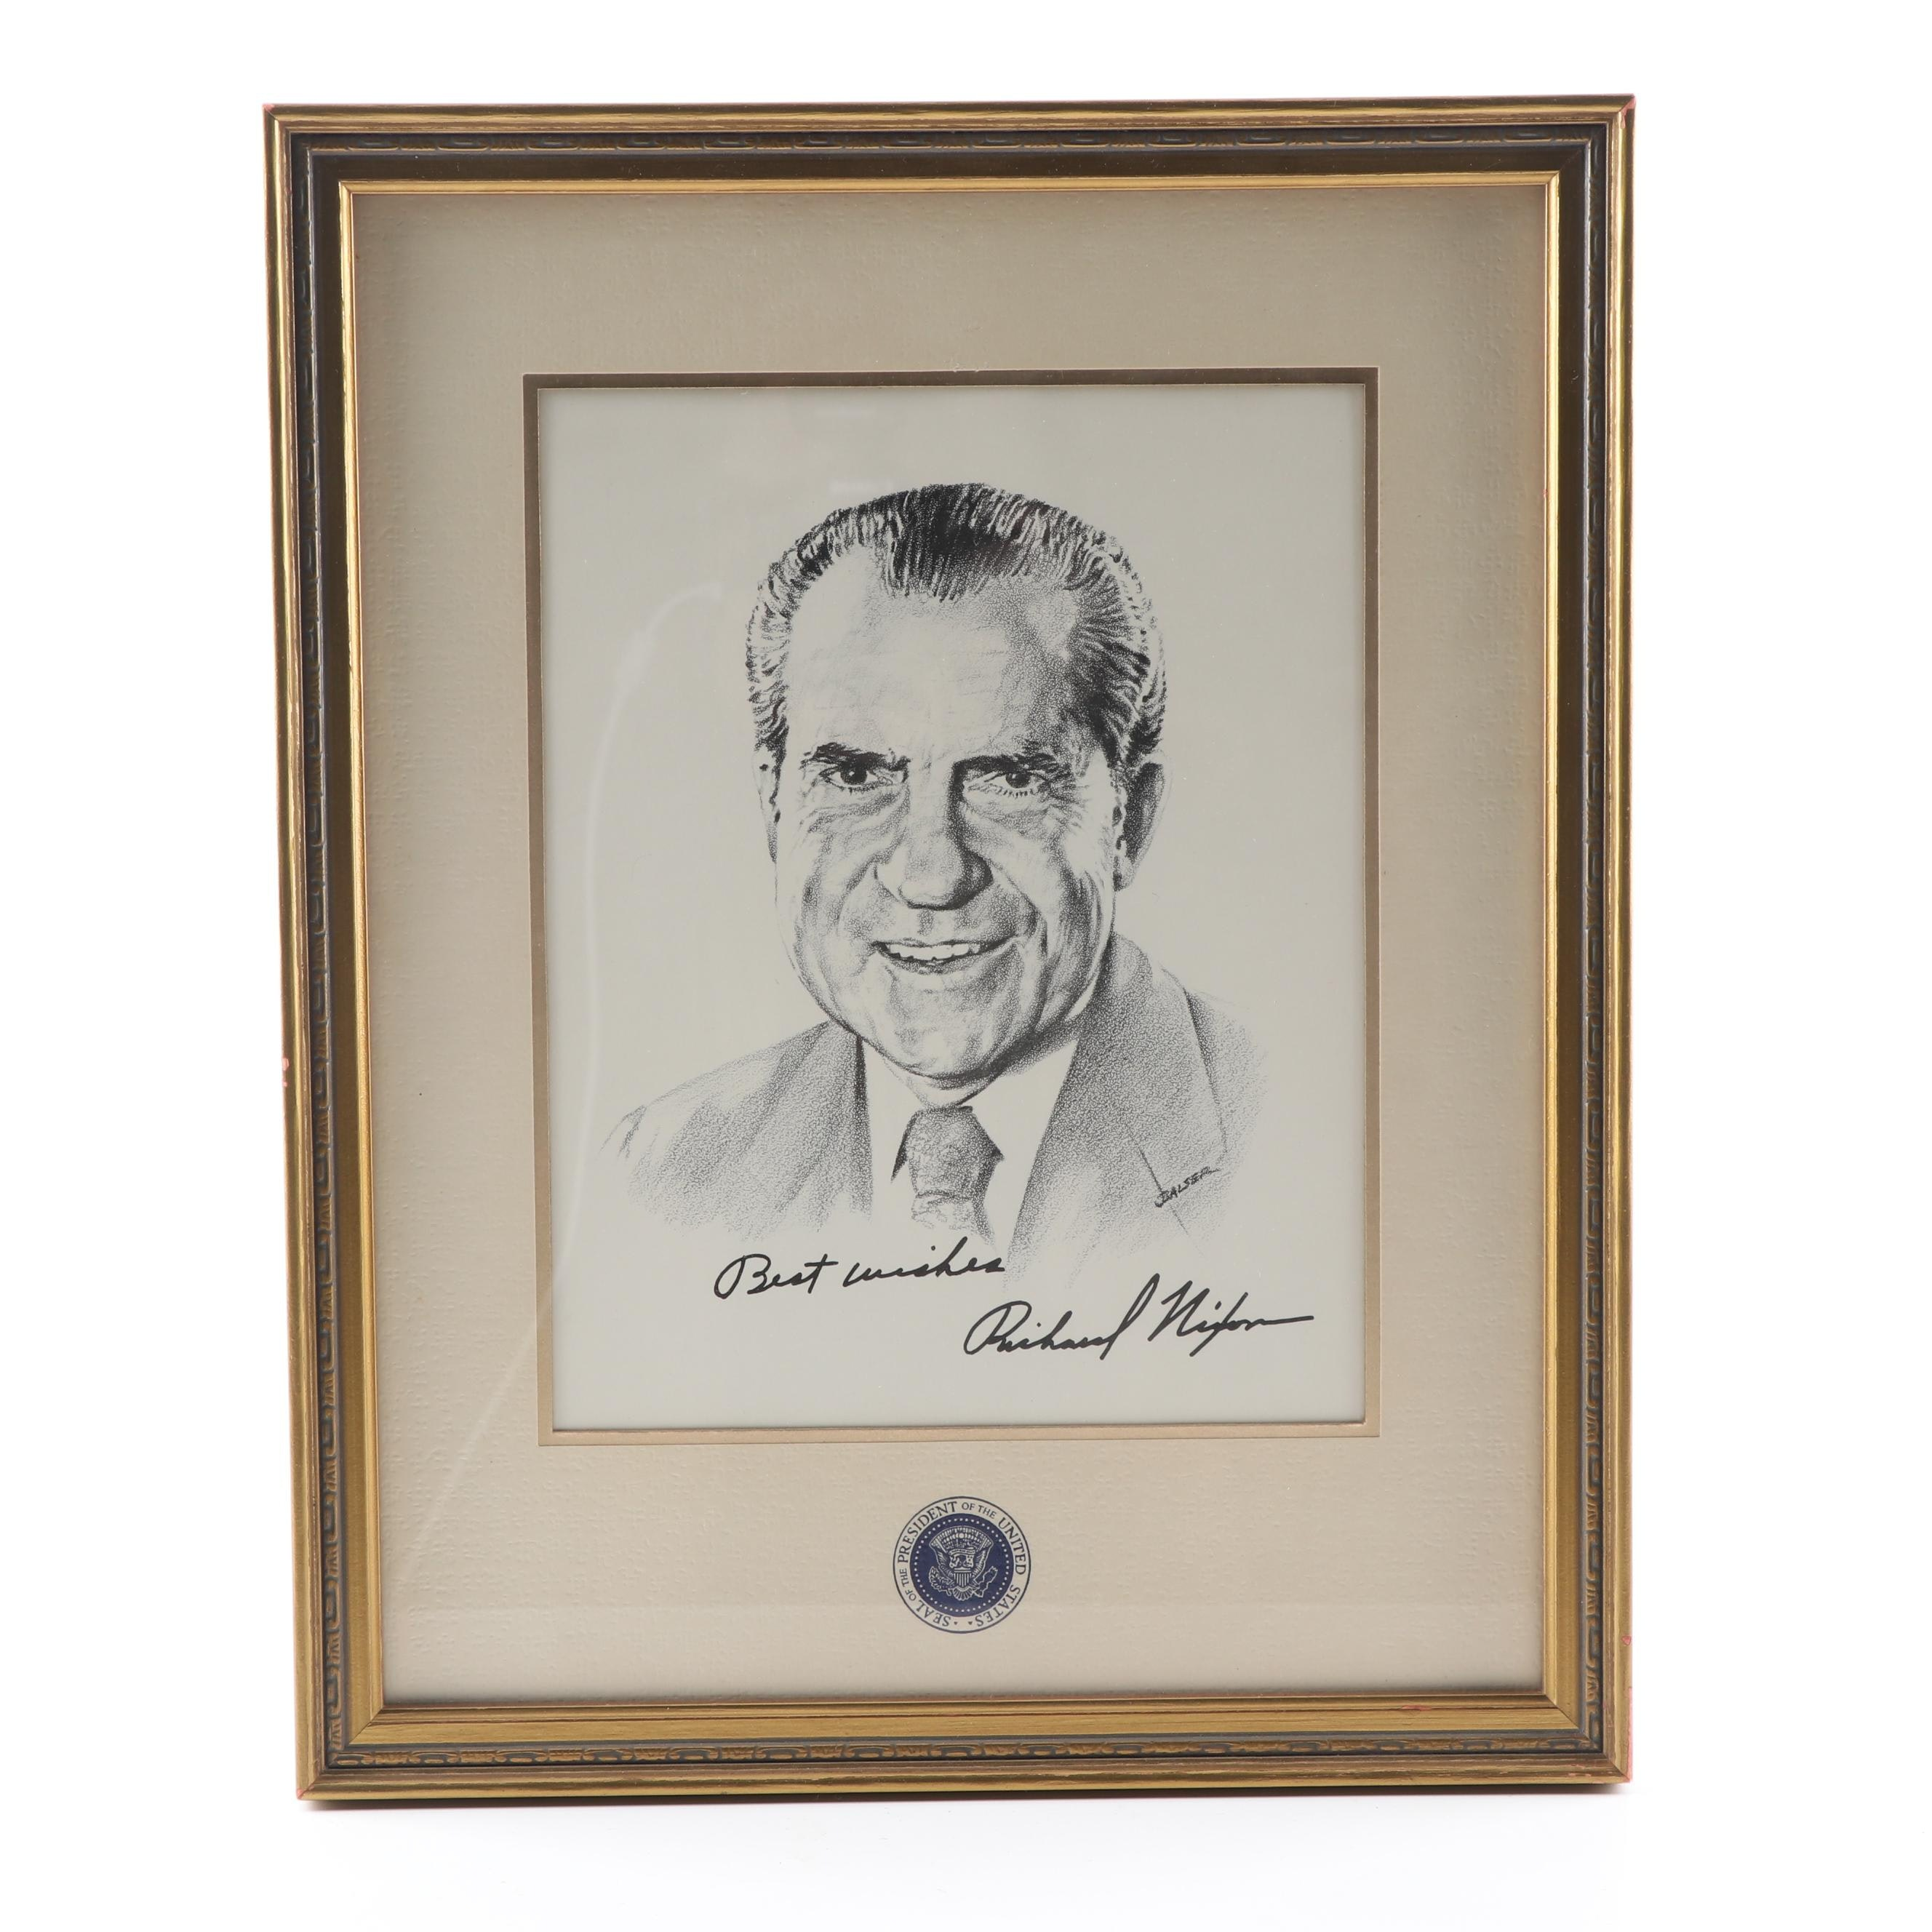 Jalser Offset Lithograph of President Nixon